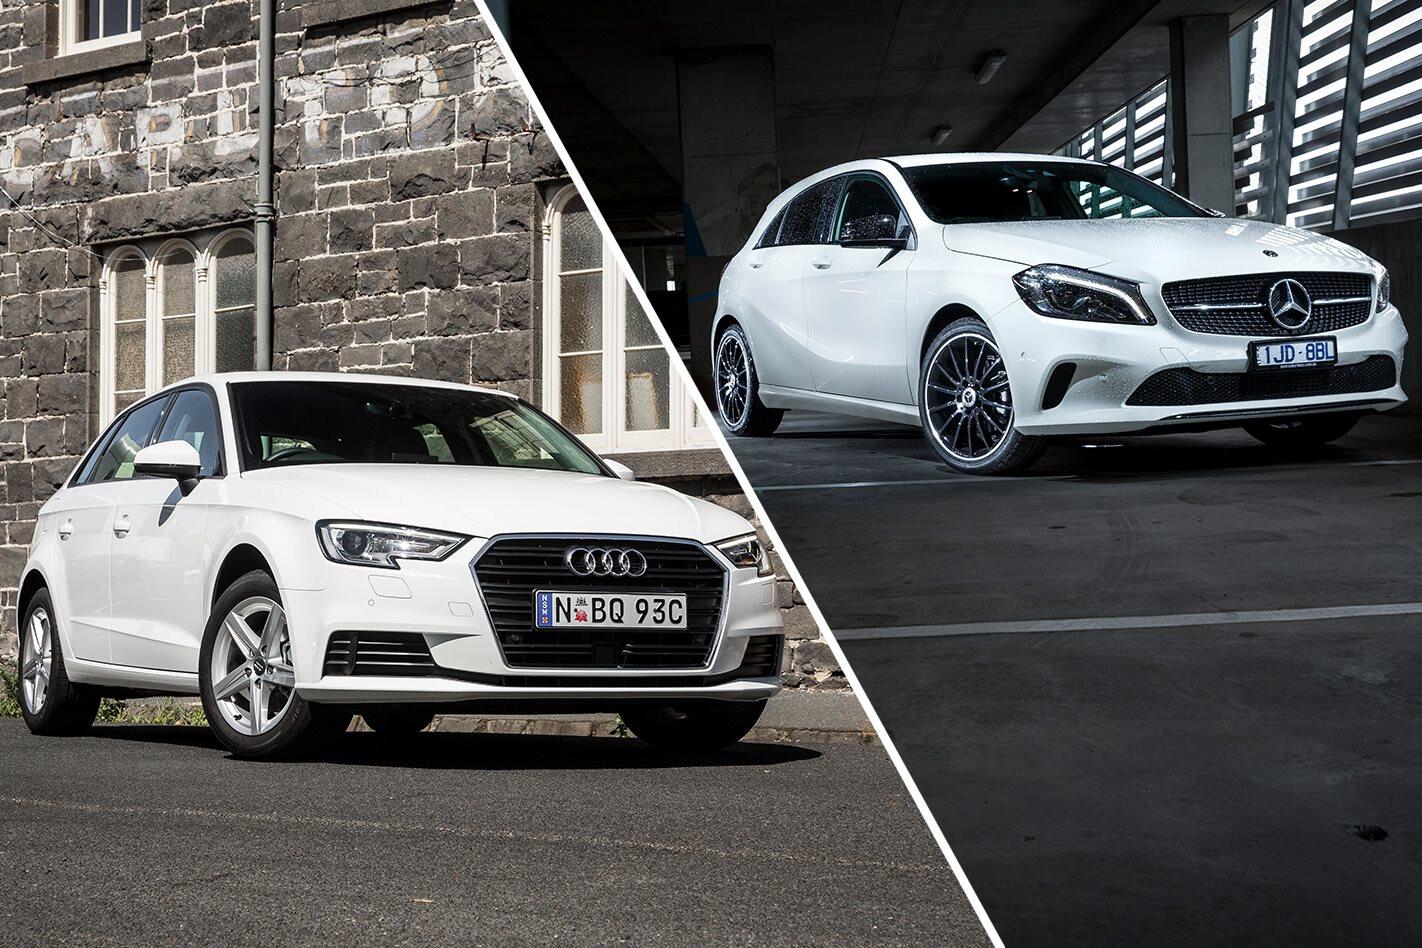 2018 Mercedes-Benz A180 City Edition vs Audi A3 Sportback 1.0 TFSI